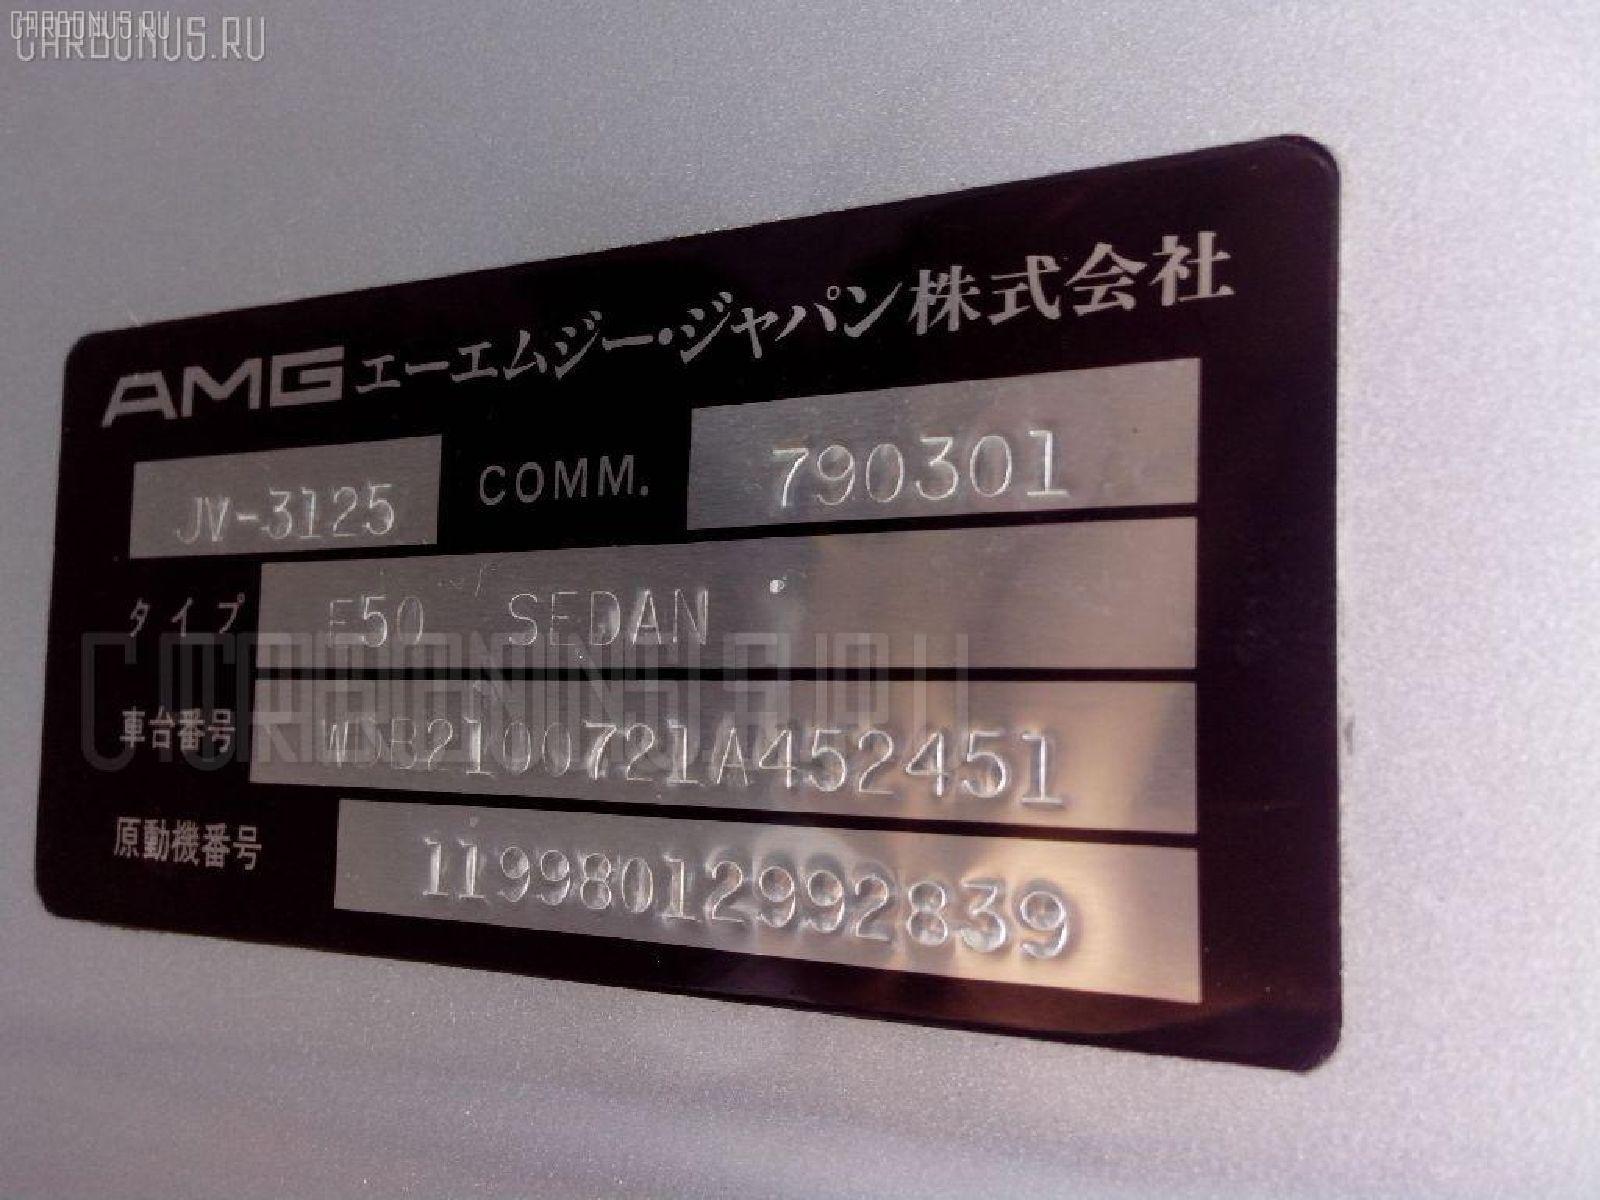 Клапан вентиляции топливного бака MERCEDES-BENZ E-CLASS W210.072 119.980 Фото 5